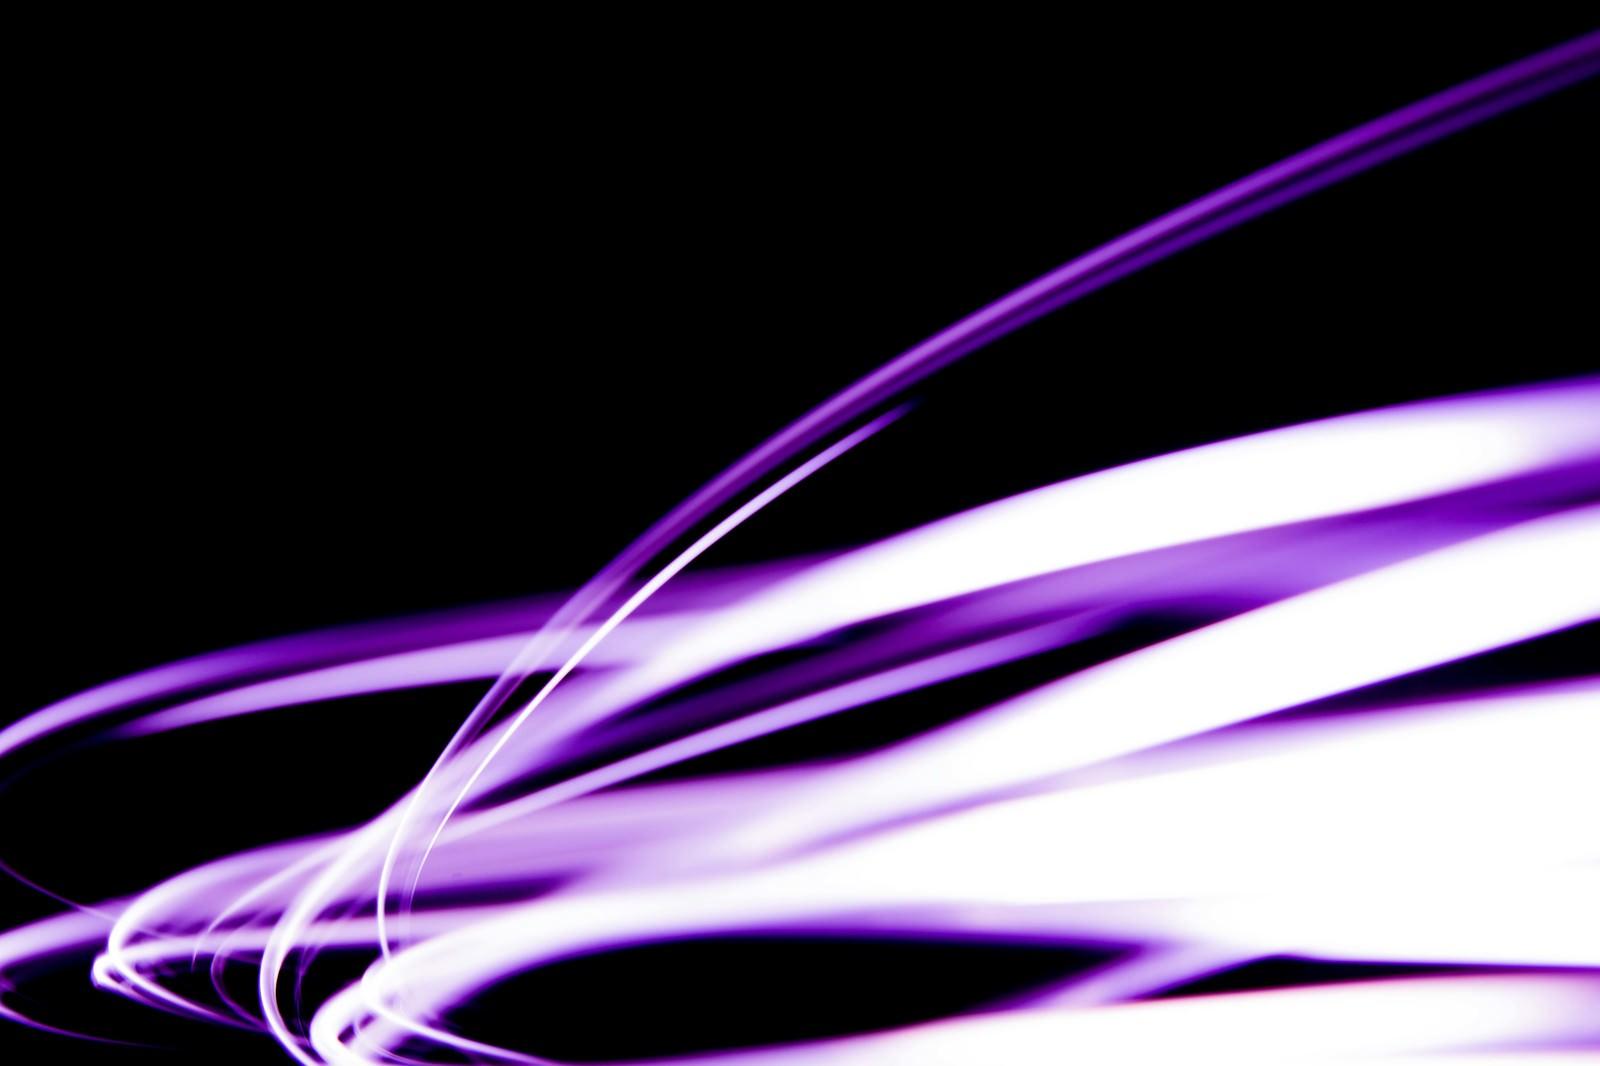 「旋光」の写真